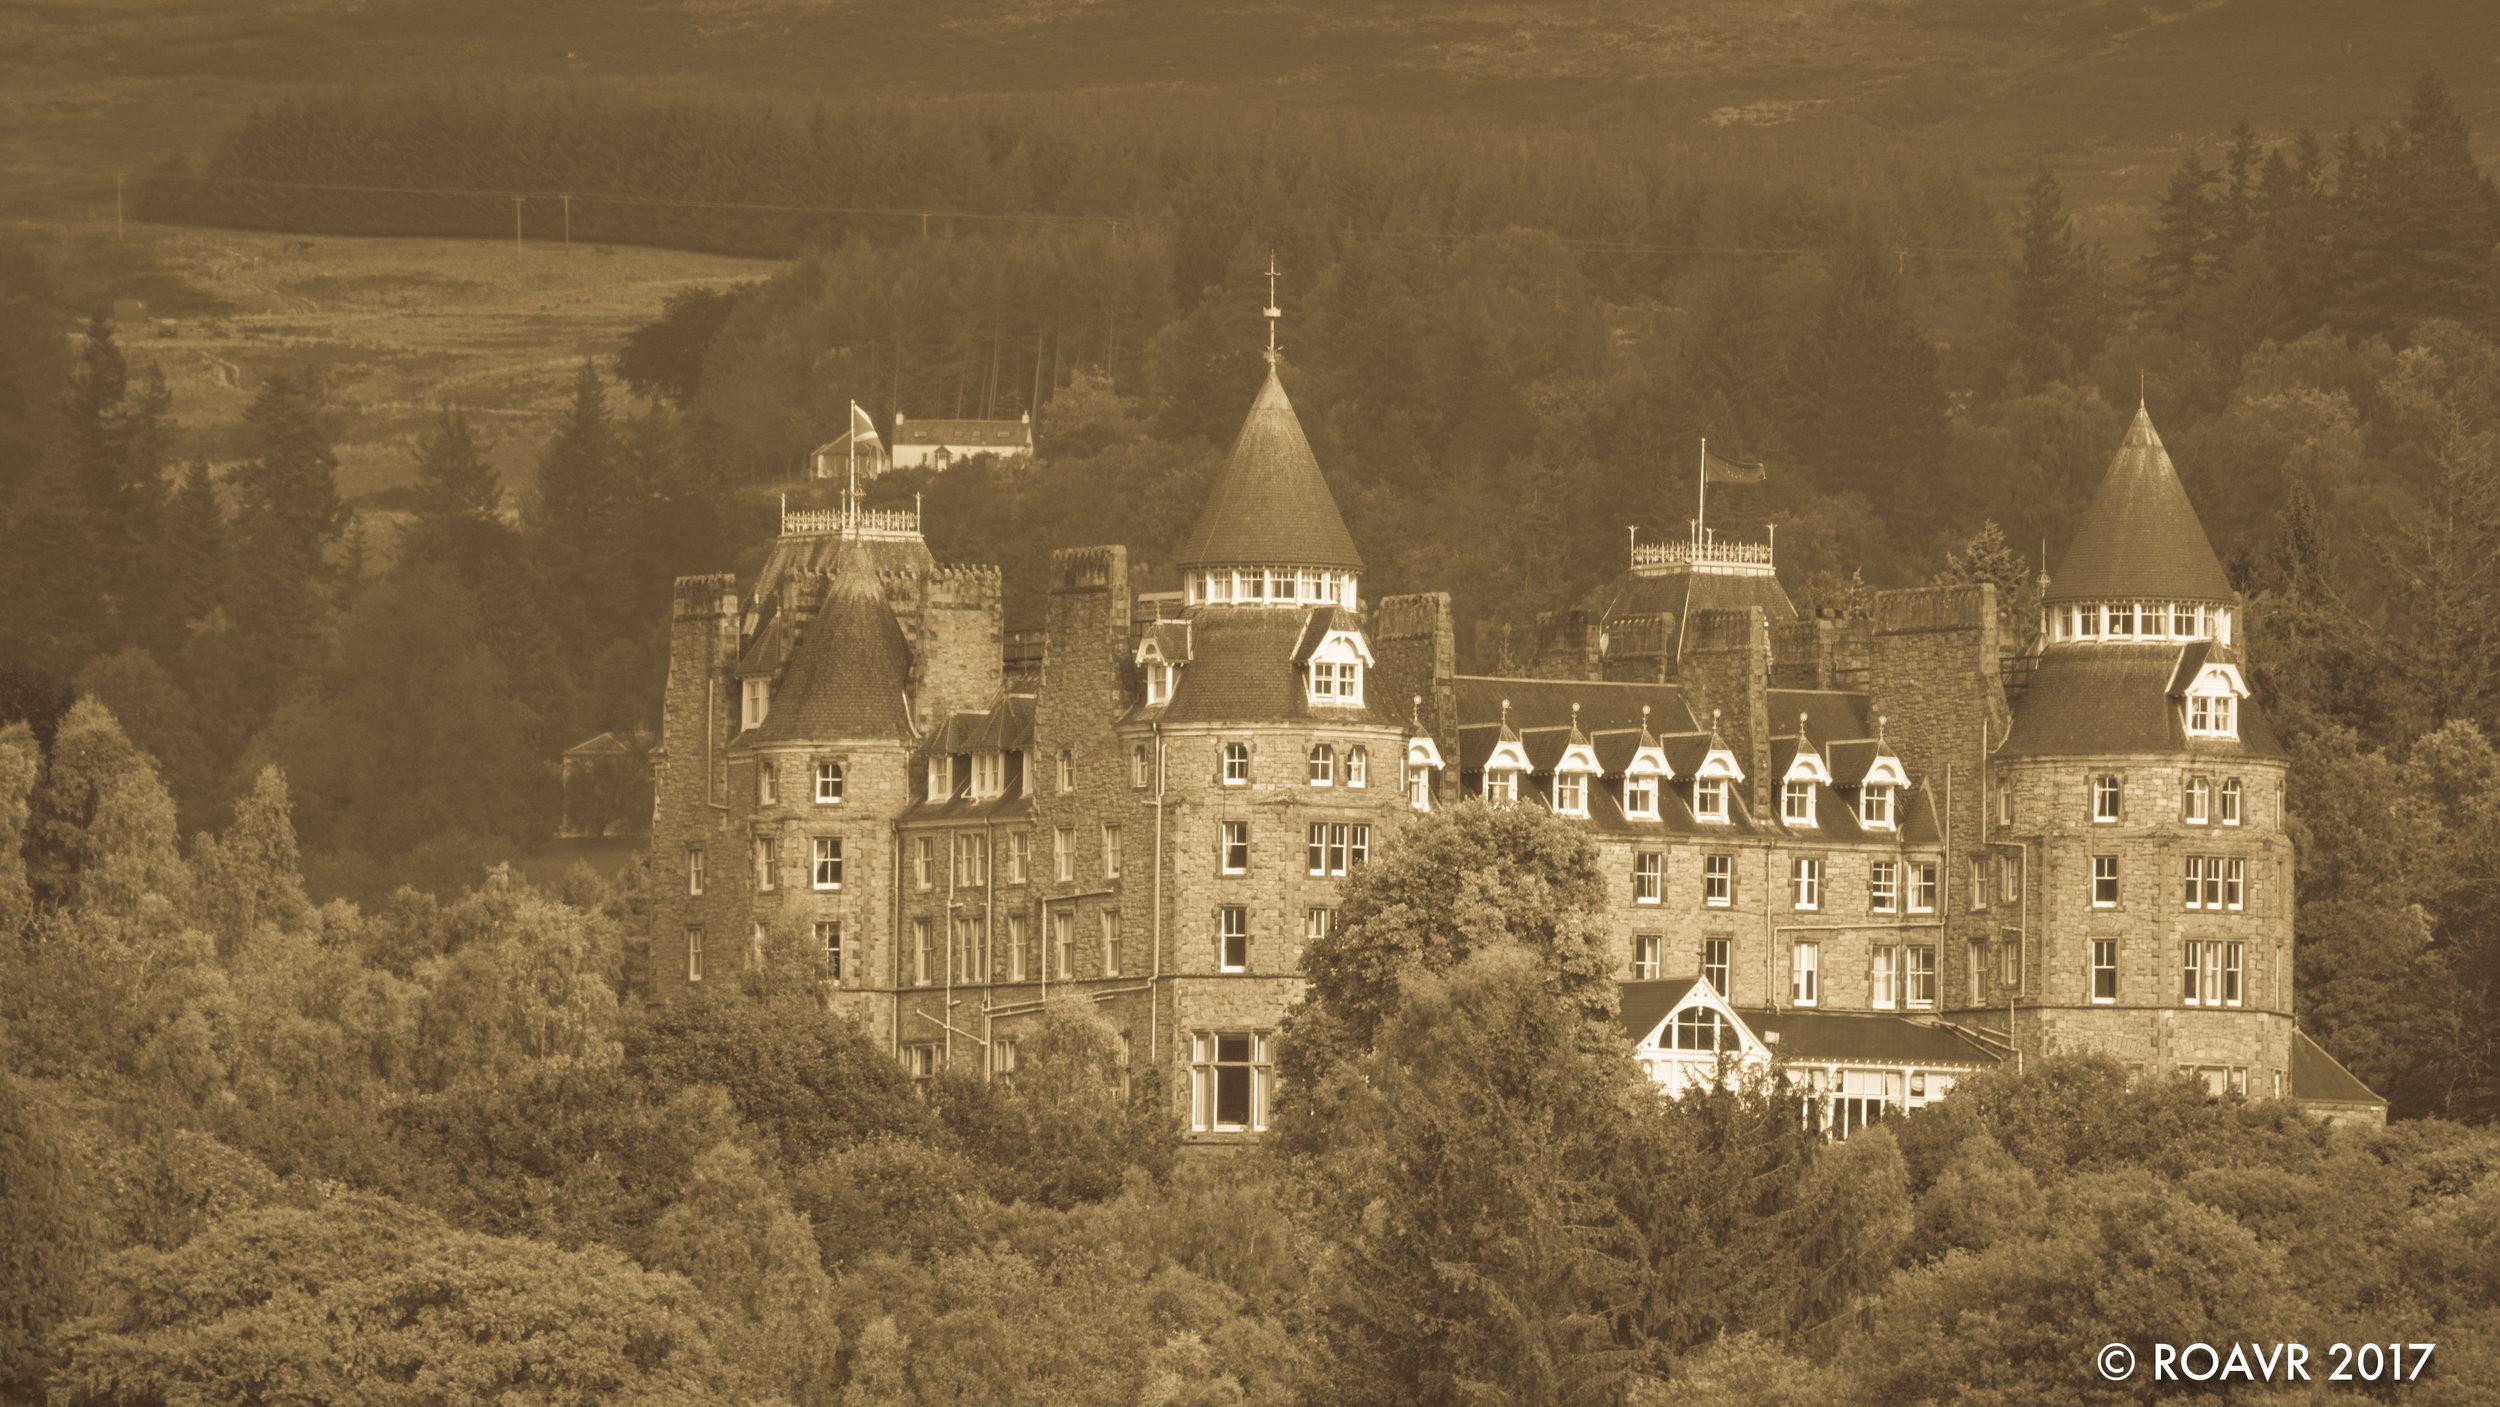 Atholl Palace Hotel - Pitlochry